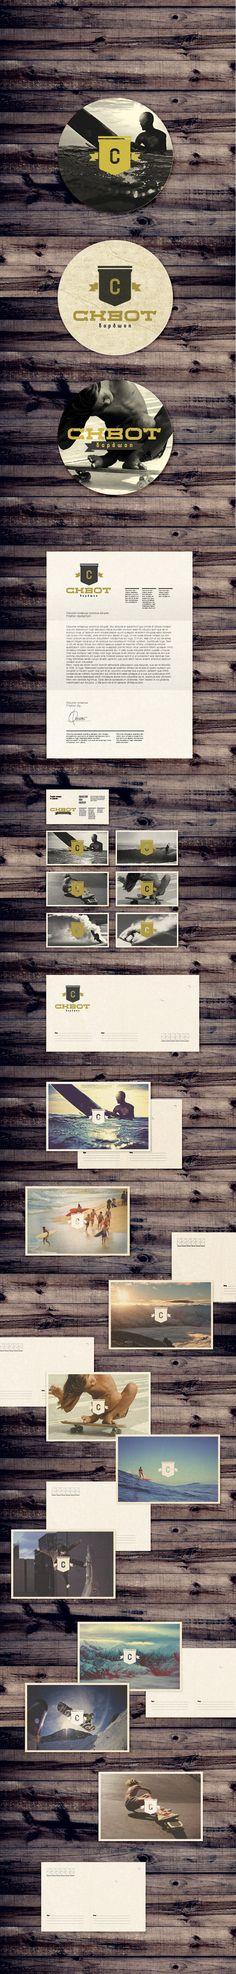 Rebranding Concept for Russian Boardshop | #stationary #corporate #design #corporatedesign #logo #identity #branding #marketing <<< repinned by an #advertising agency from #Hamburg / #Germany - www.BlickeDeeler.de | Follow us on www.facebook.com/BlickeDeeler